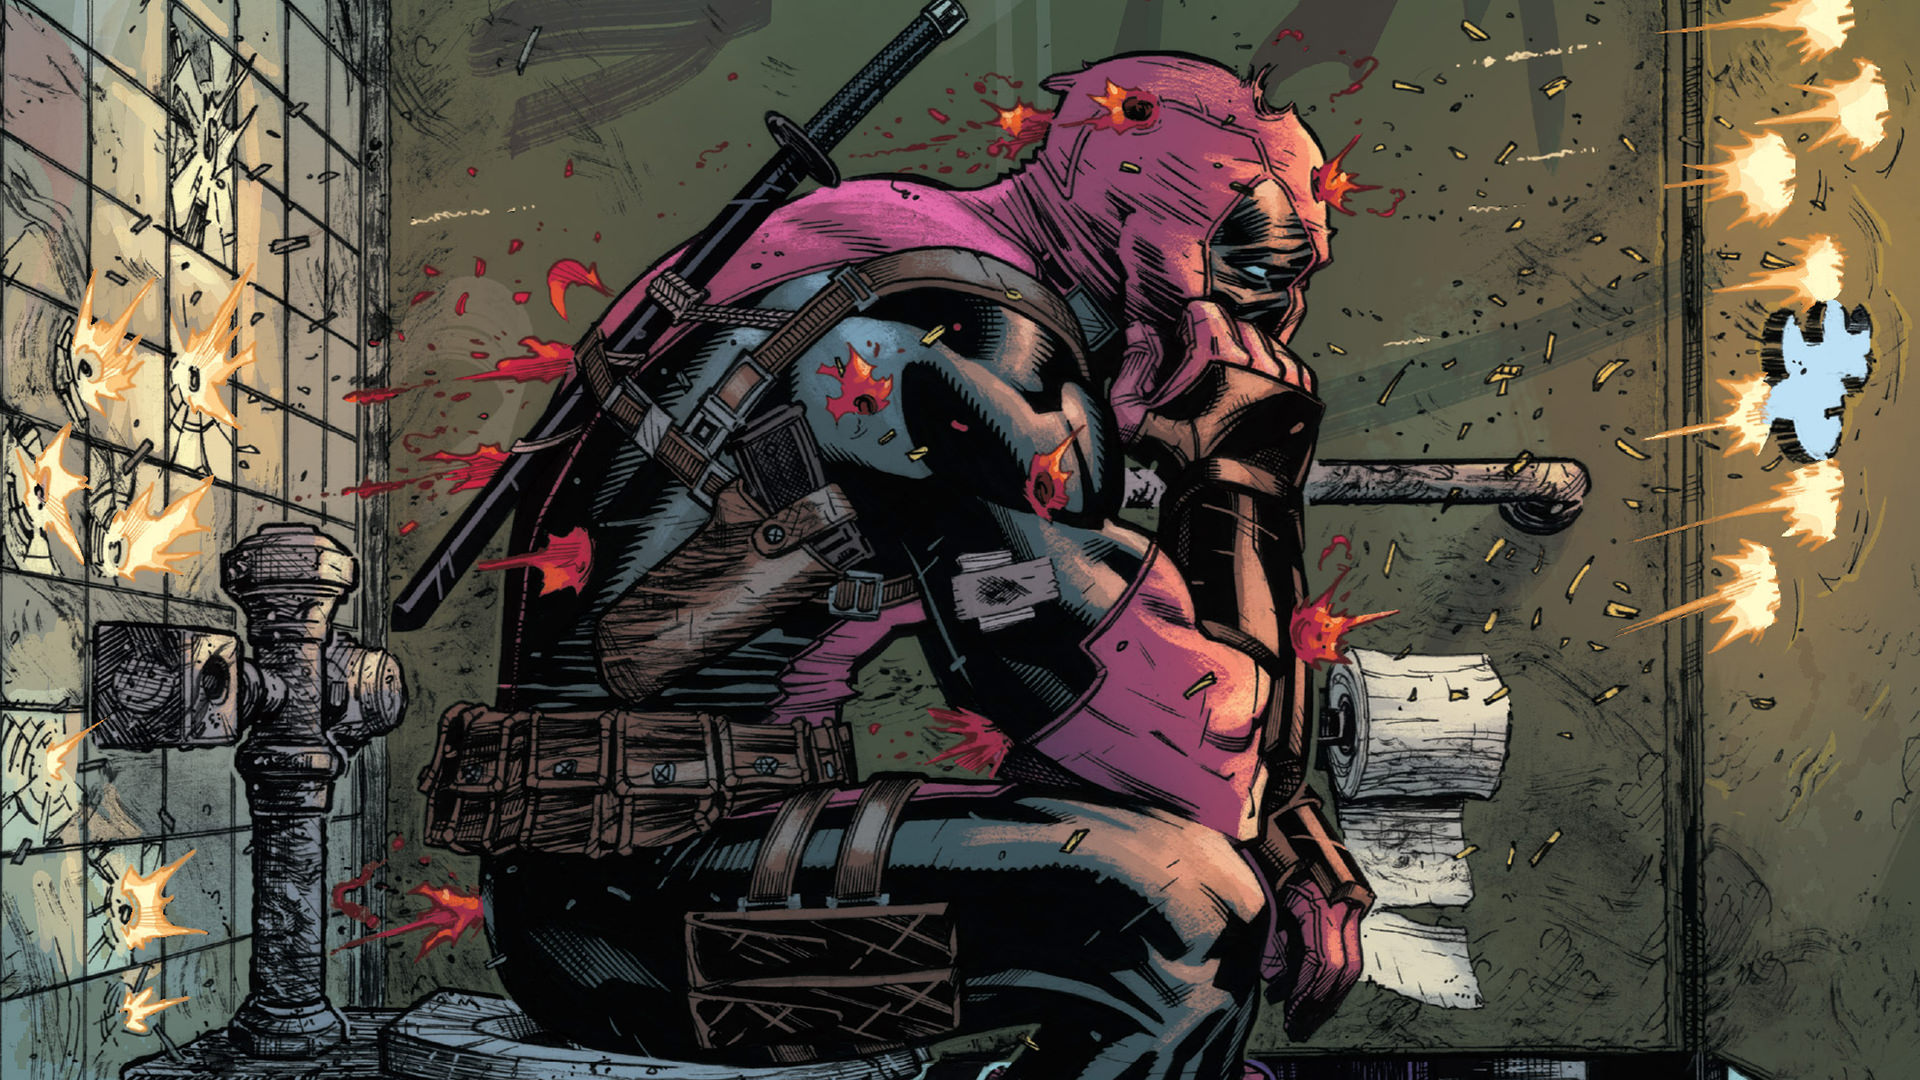 General 1920x1080 Deadpool toilet paper shooting blood Wade Wilson Marvel Comics